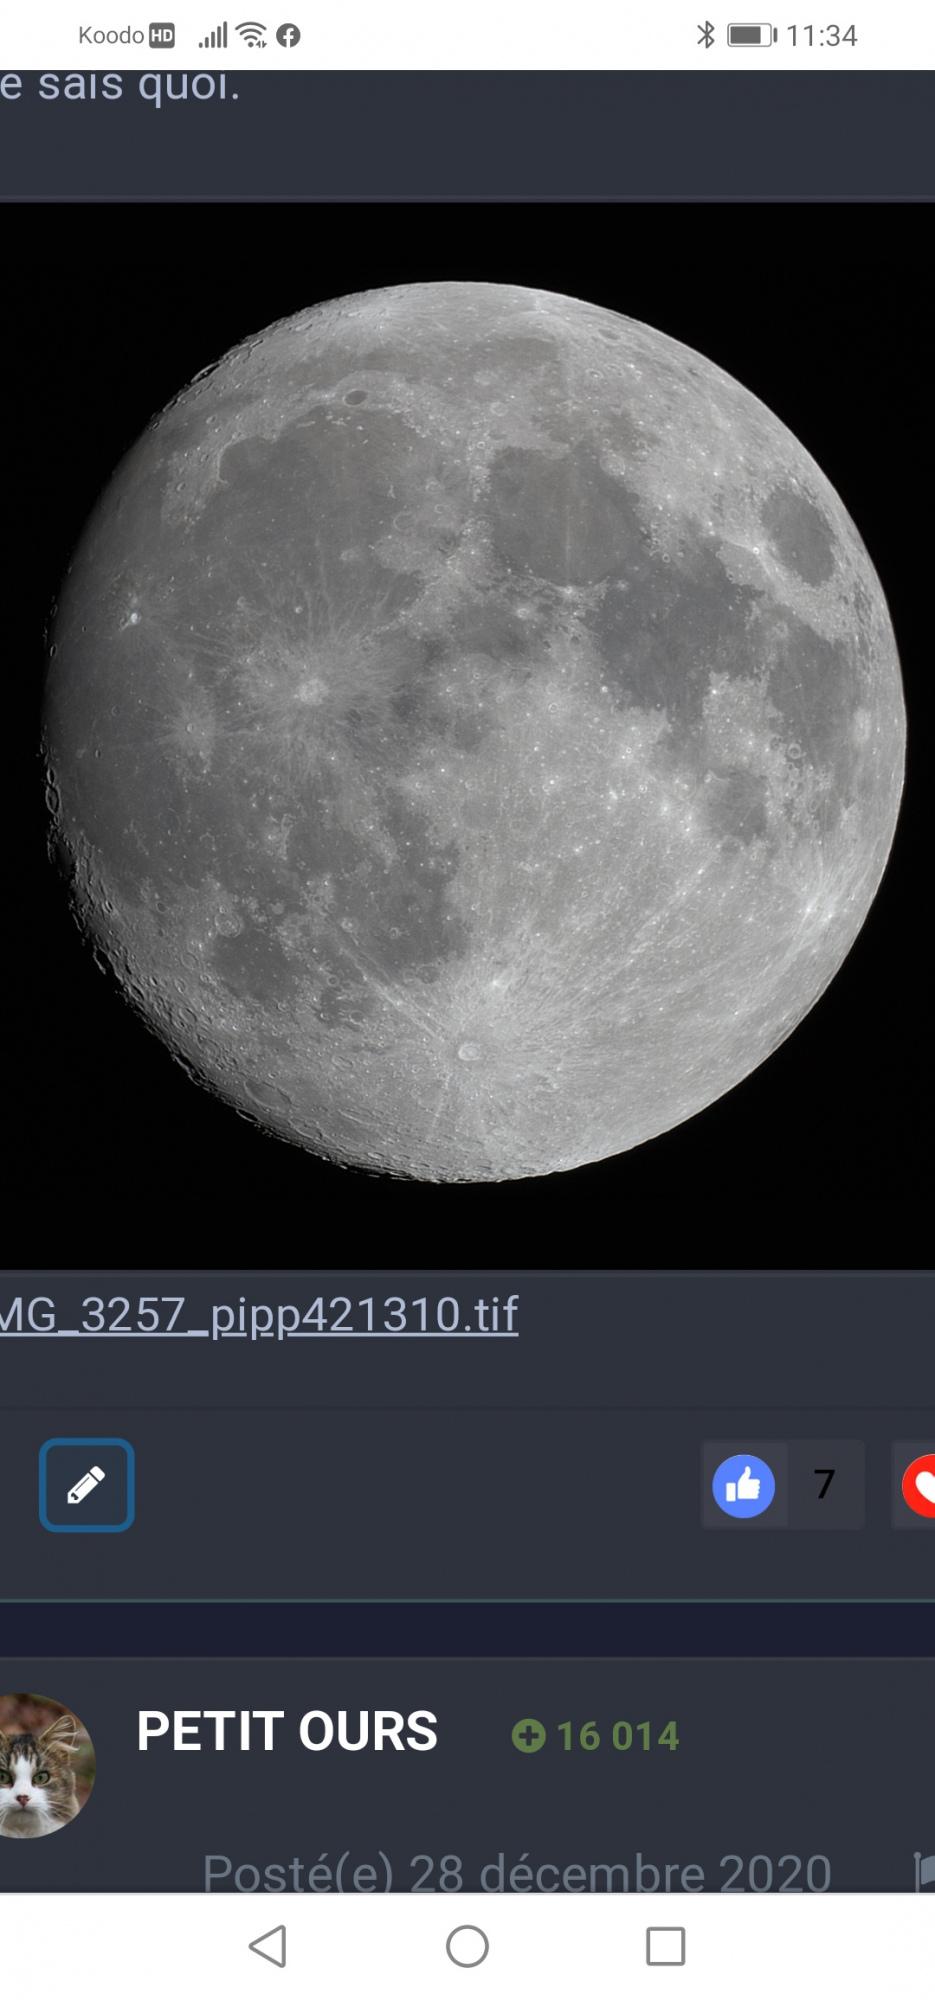 Screenshot_20210125_113420_com.android.chrome.thumb.jpg.96b8fd8566feb20da974637896d1b2f4.jpg